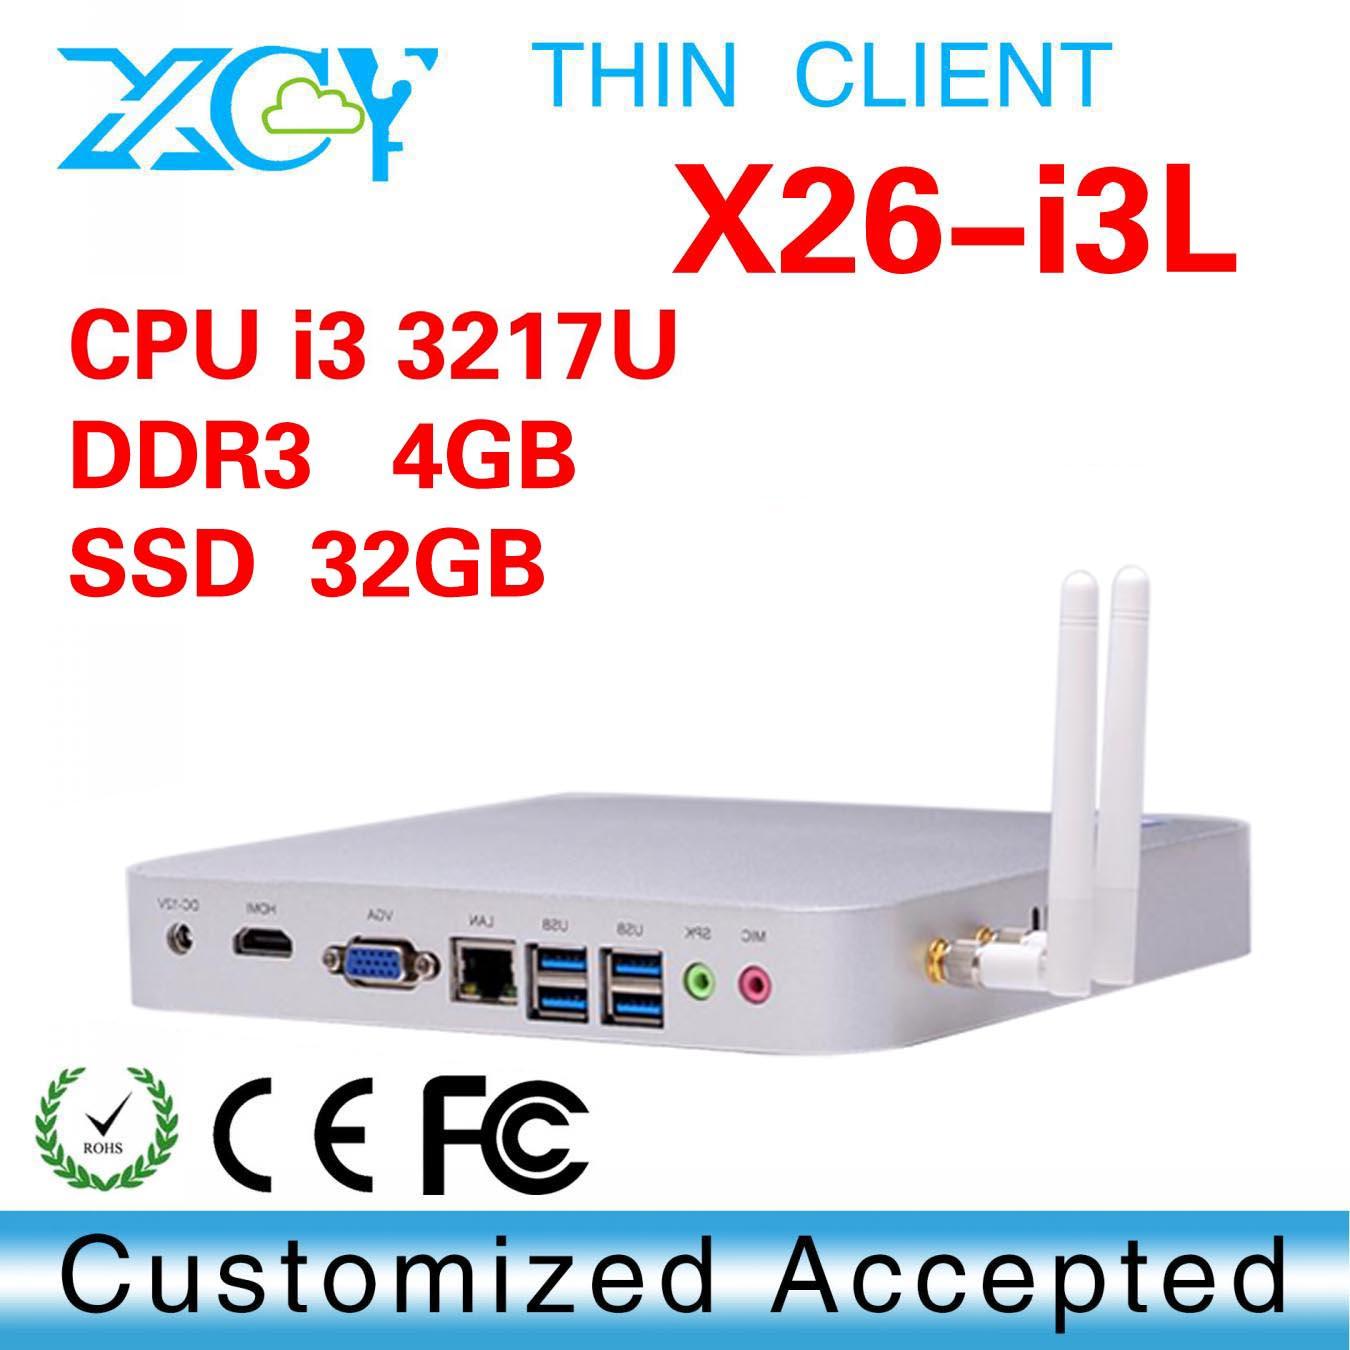 Home Theater PCs, Intel dual core 3217U 1.8GHz Custom PCs, network thin client(China (Mainland))